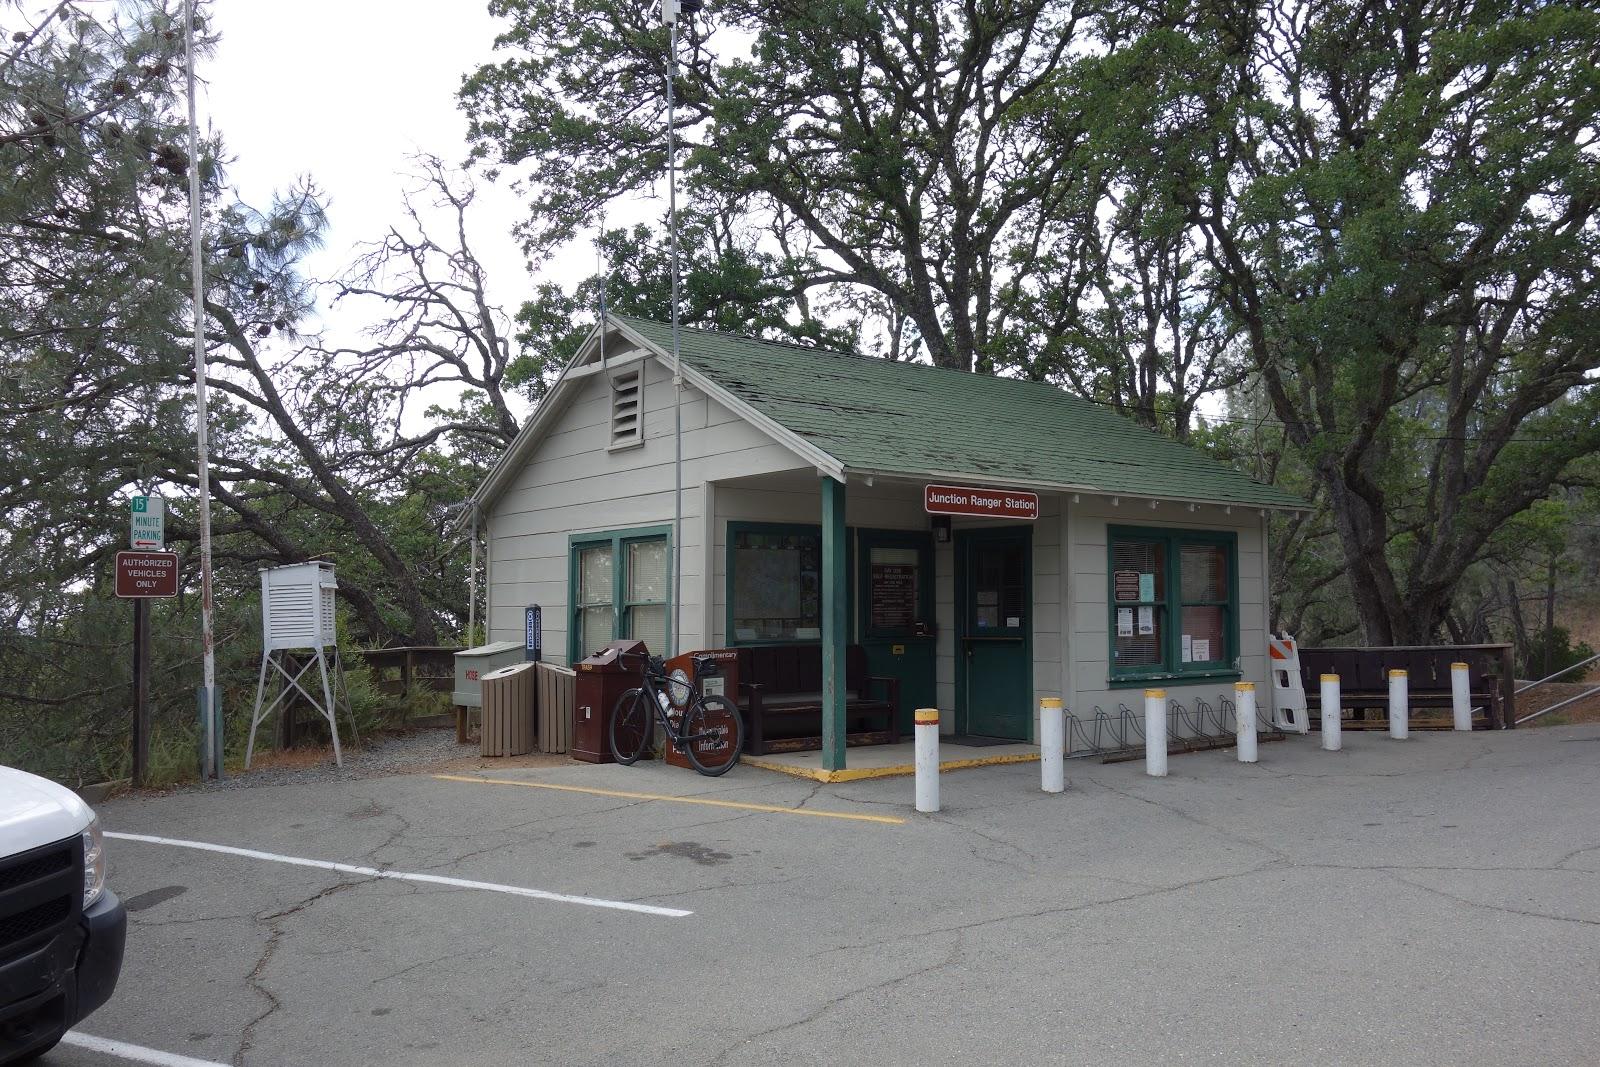 Bicycle ride Mt. Diablo - front of Junction Ranger Station